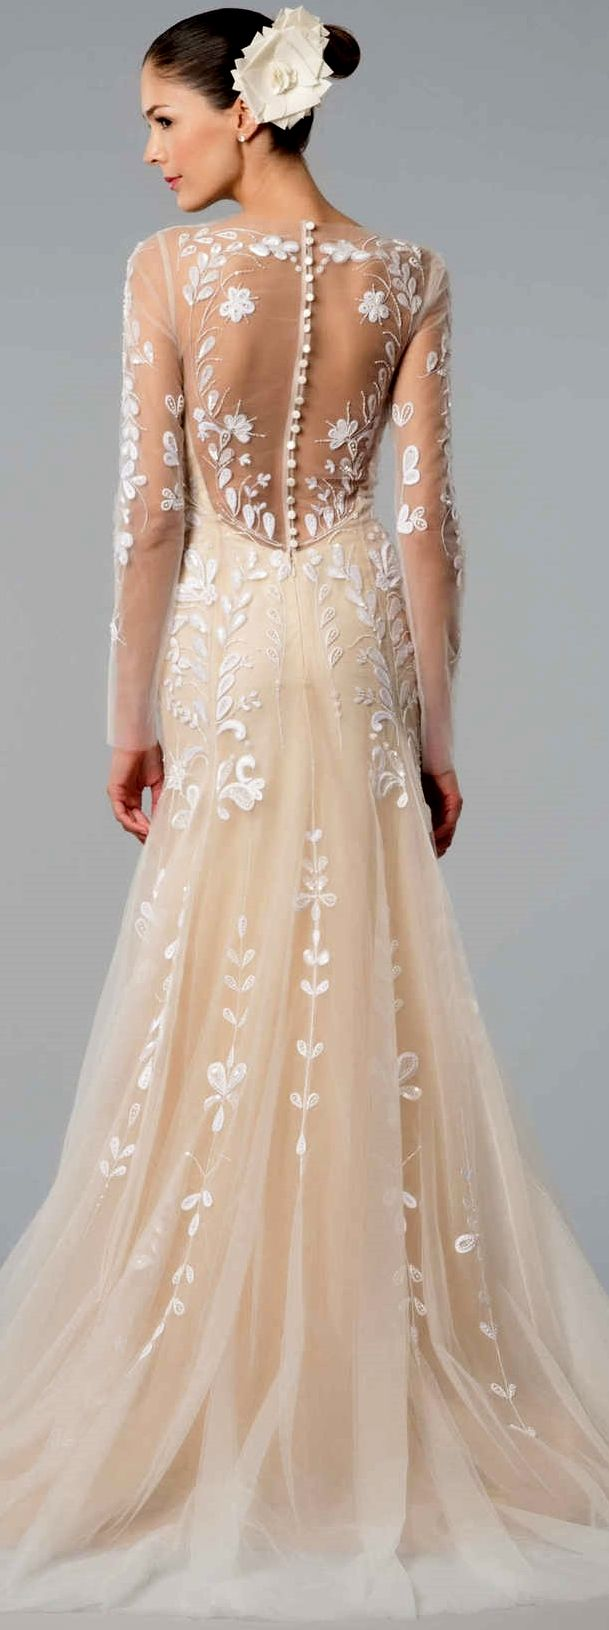 Carolina Herrera ~ Evening Gown, Beige | Romantic Things | Pinterest ...